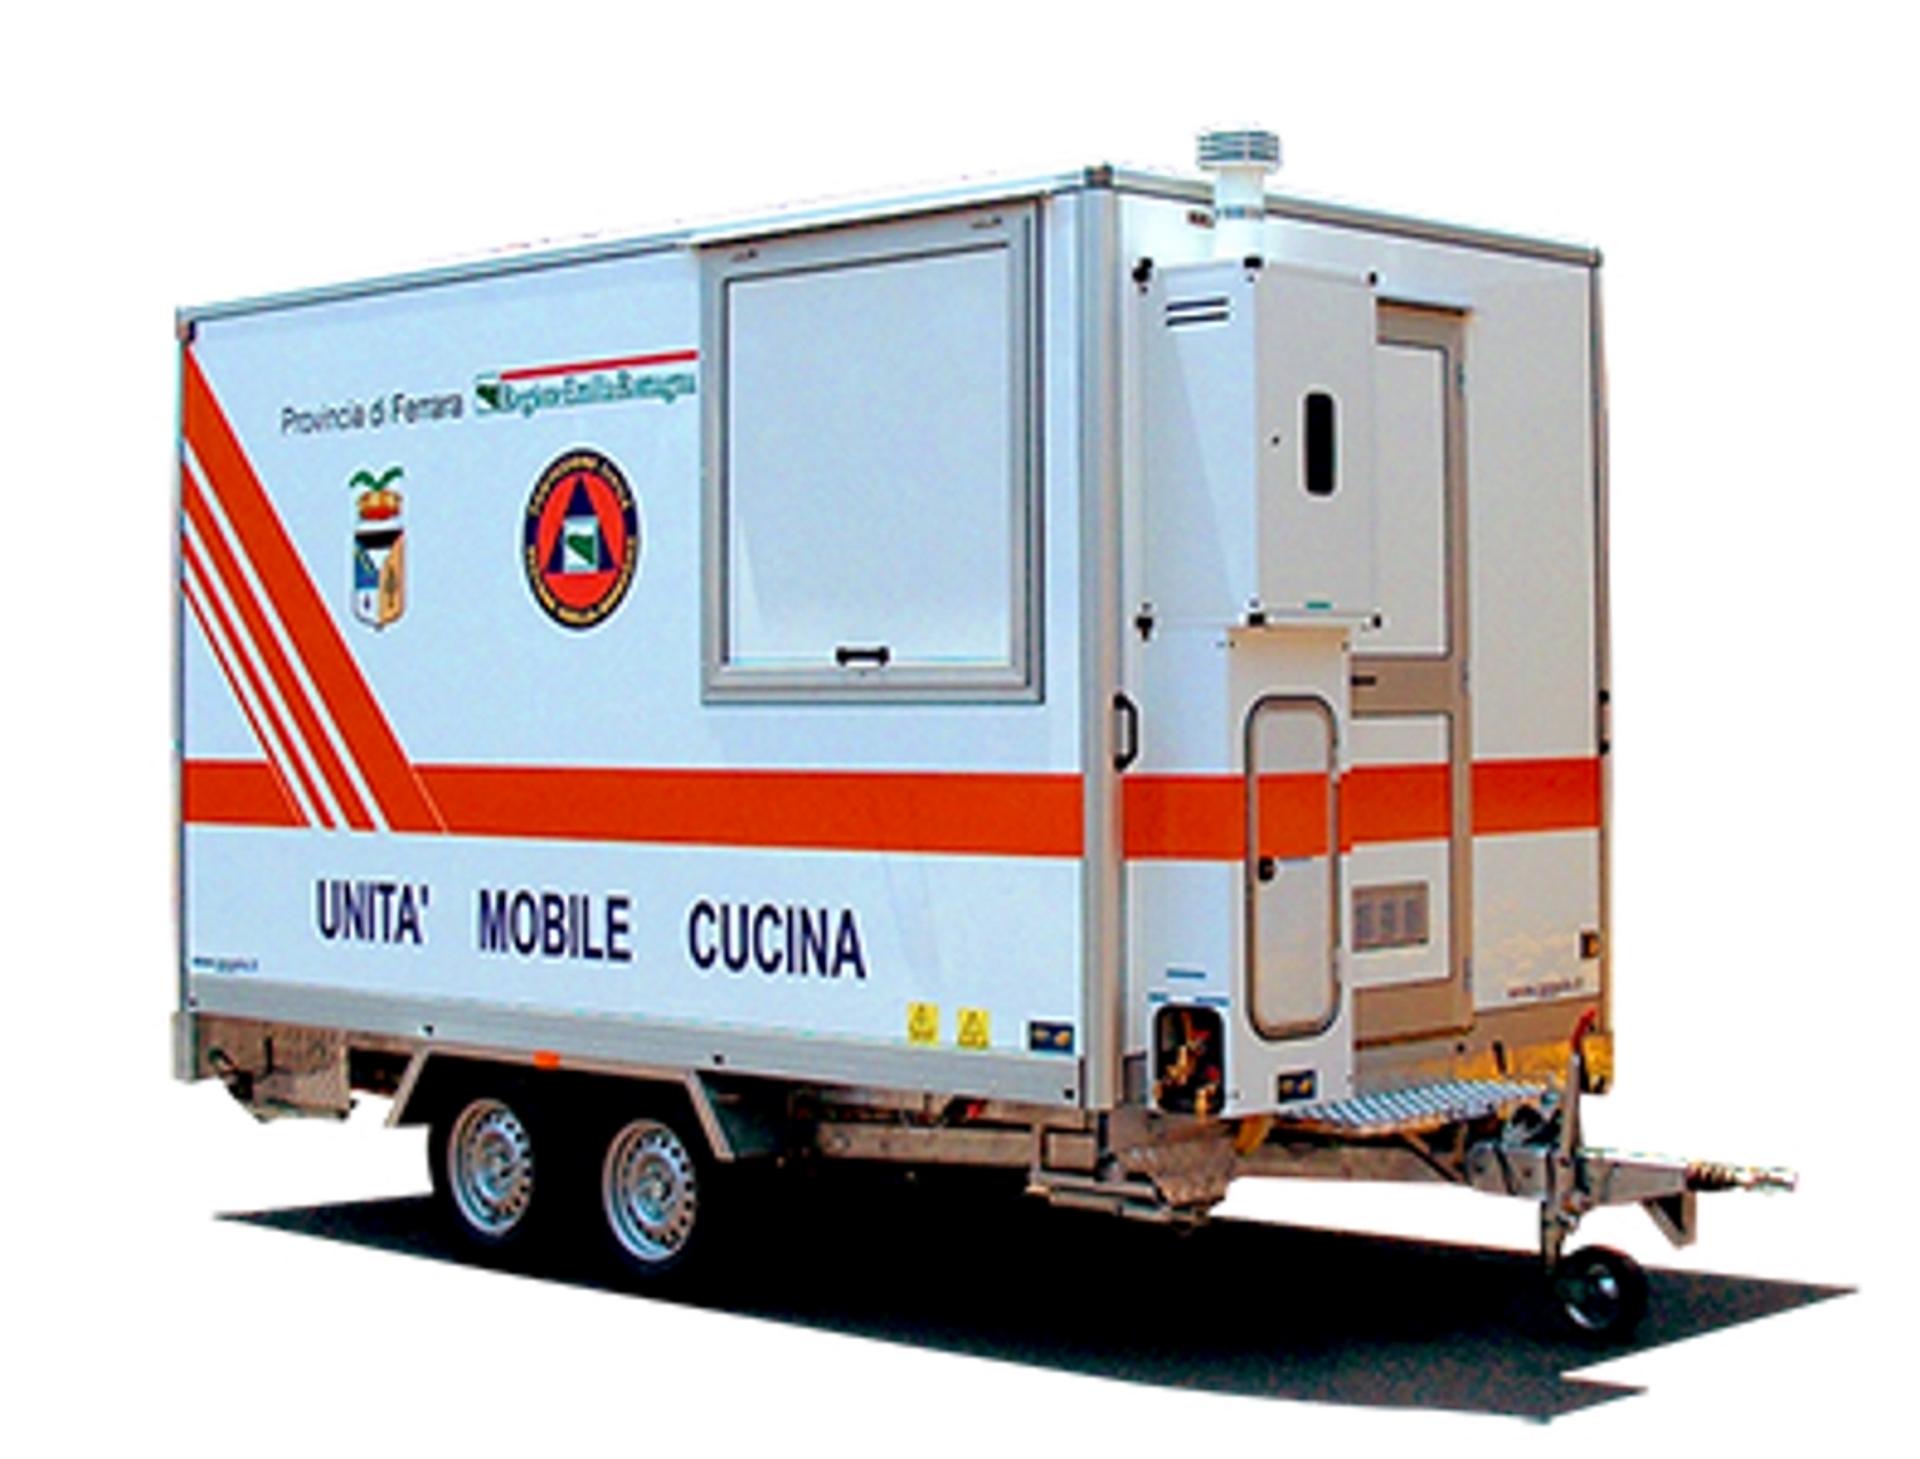 Cucine mobili per street food e allestimenti speciali for Mobili per cucine